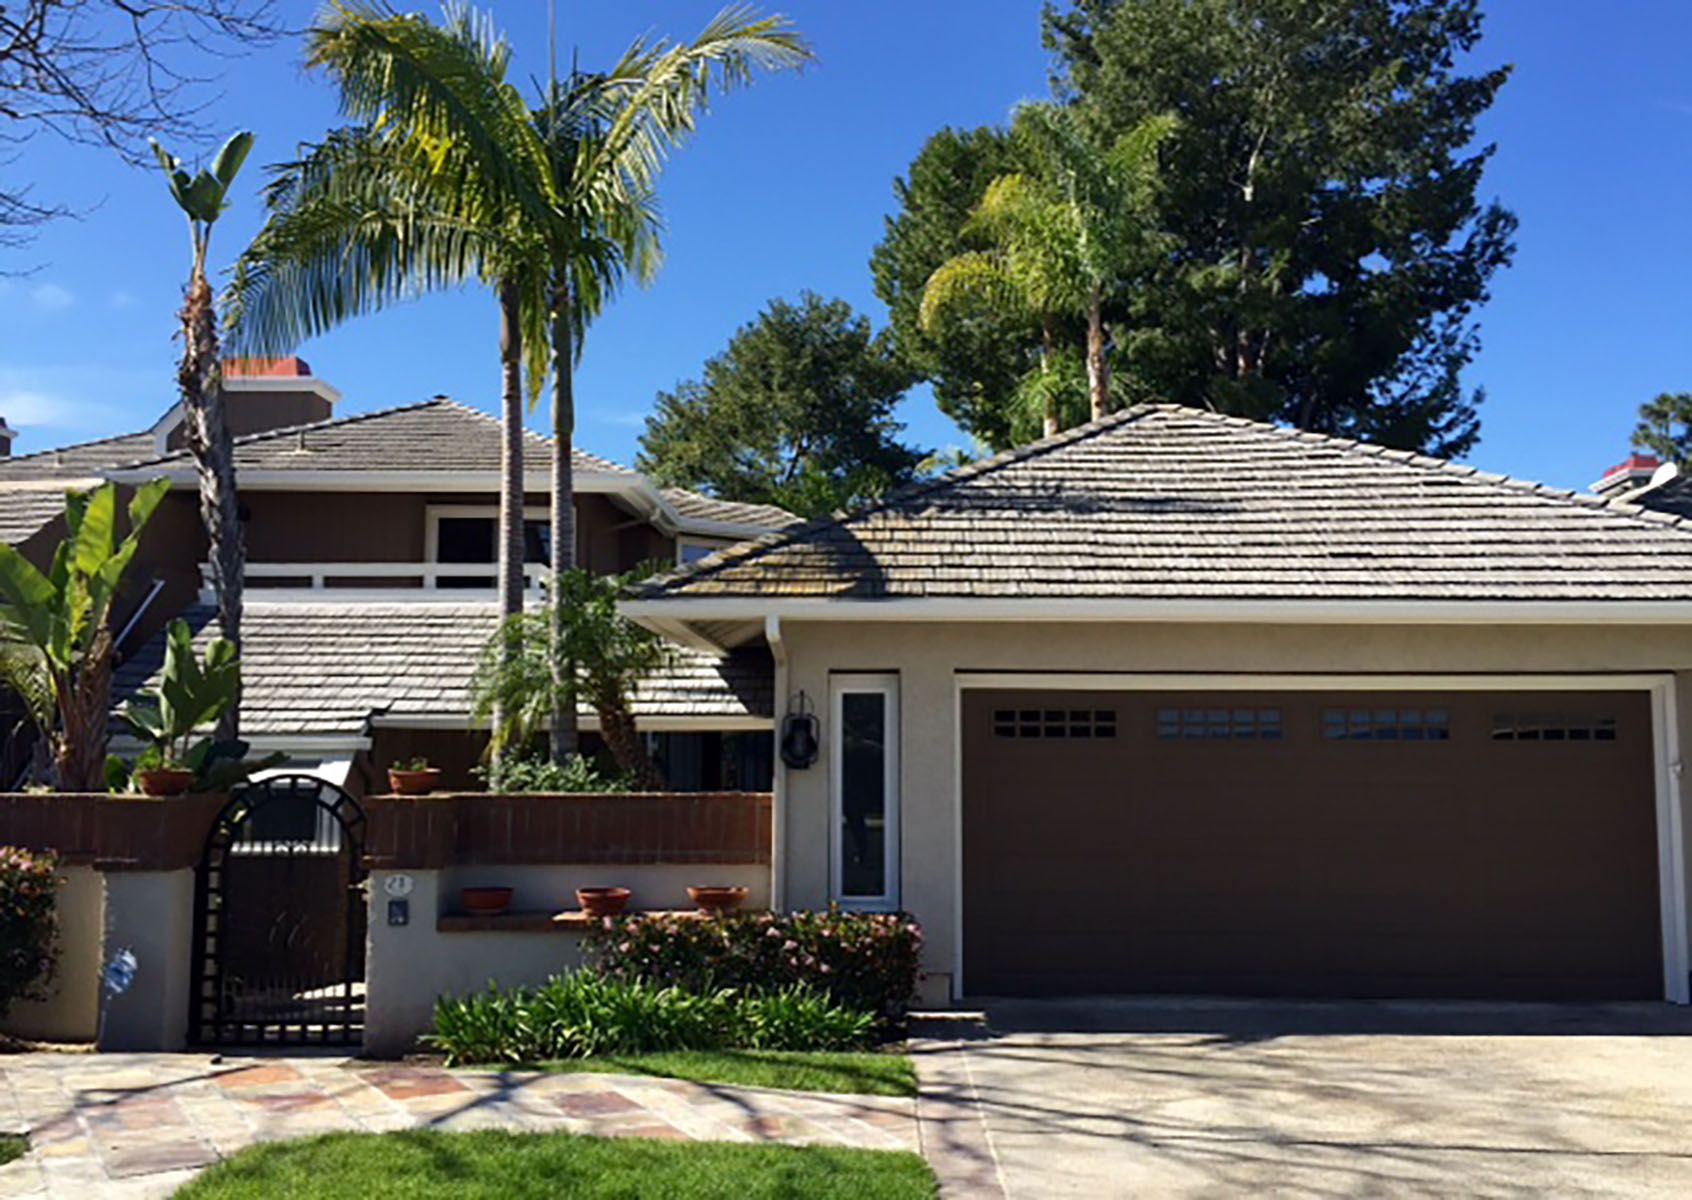 Condominio por un Venta en 21 Coventry #14 Newport Beach, California 92660 Estados Unidos